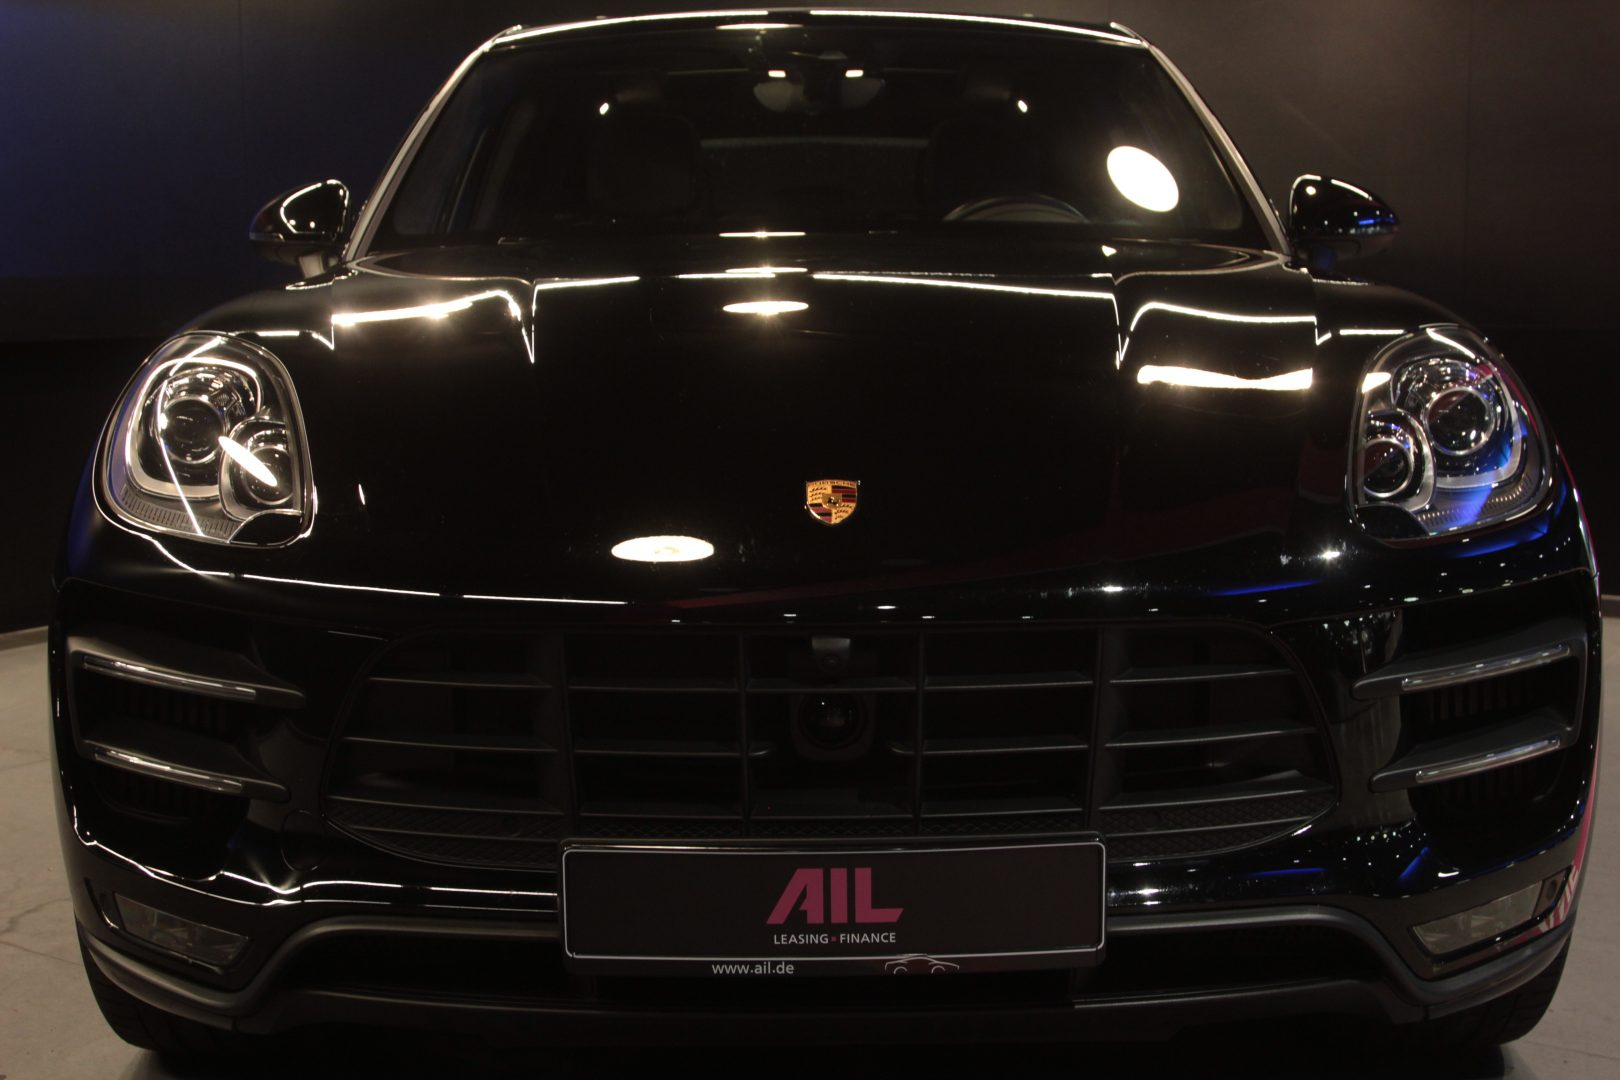 AIL Porsche Macan Turbo 3